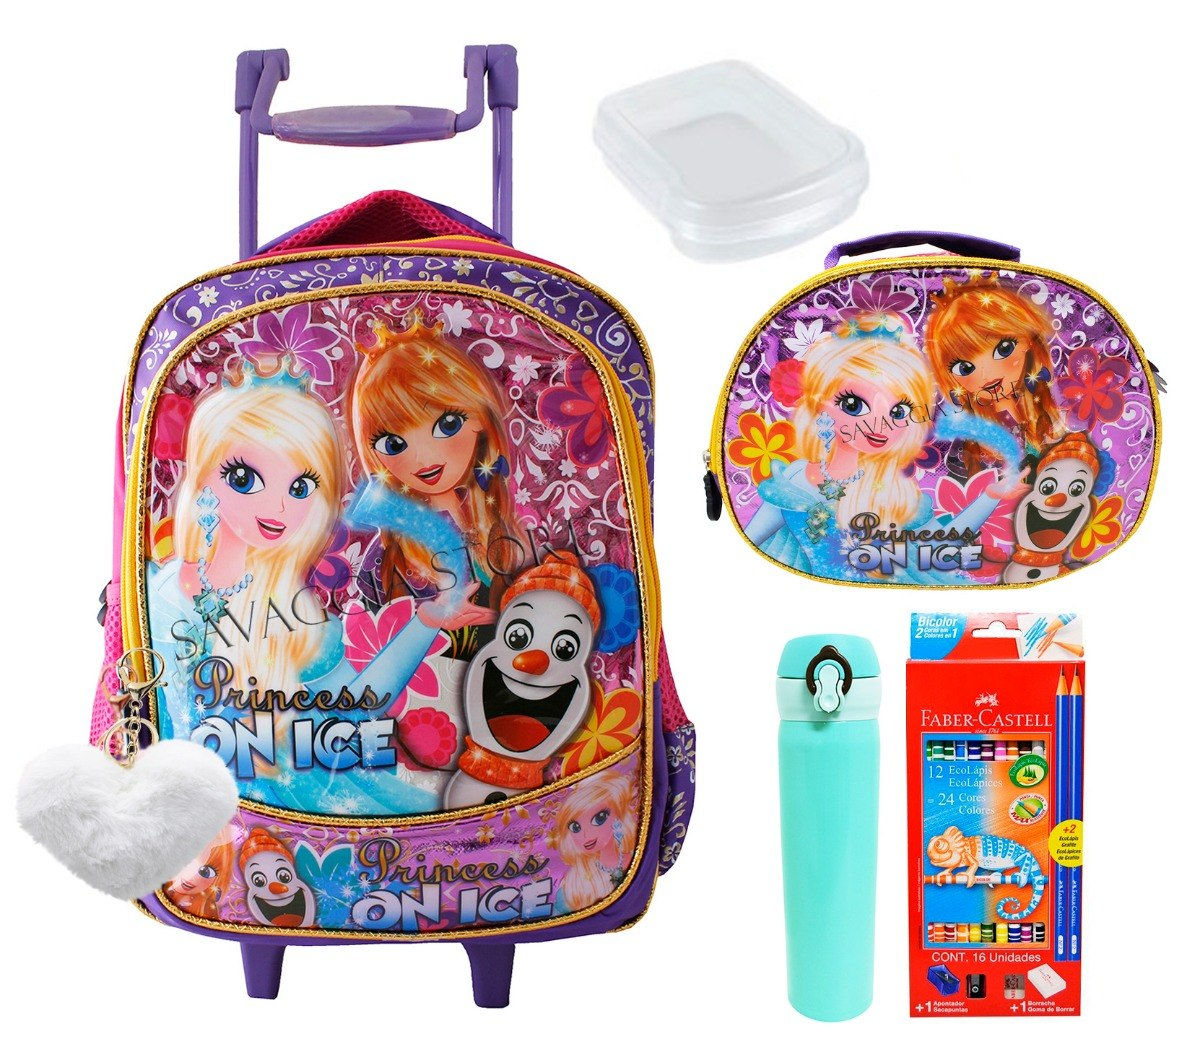 efa1f0e97 mochila infantil escolar feminina rodinhas tipo frozen + kit. Carregando  zoom.